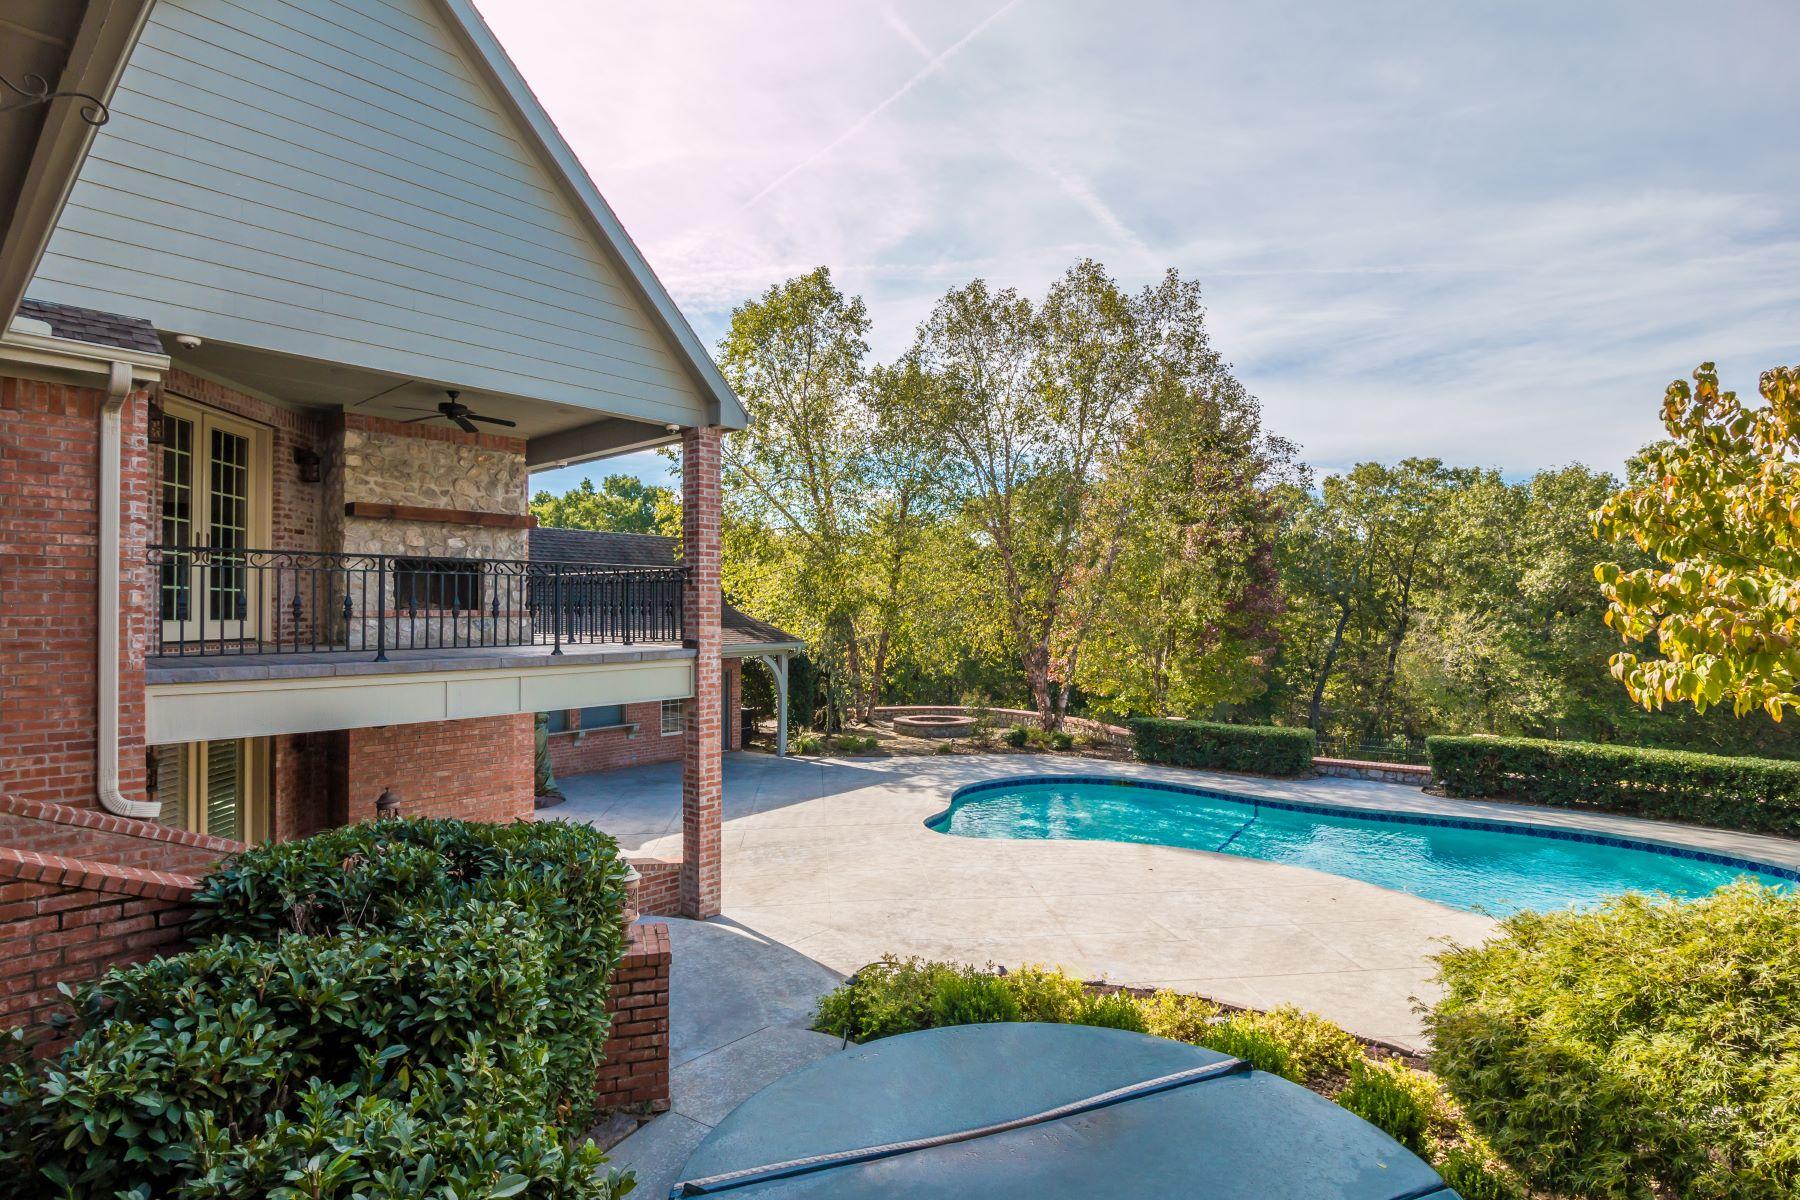 Single Family Homes for Sale at 11091 Timarron Drive Bentonville, Arkansas 72712 United States